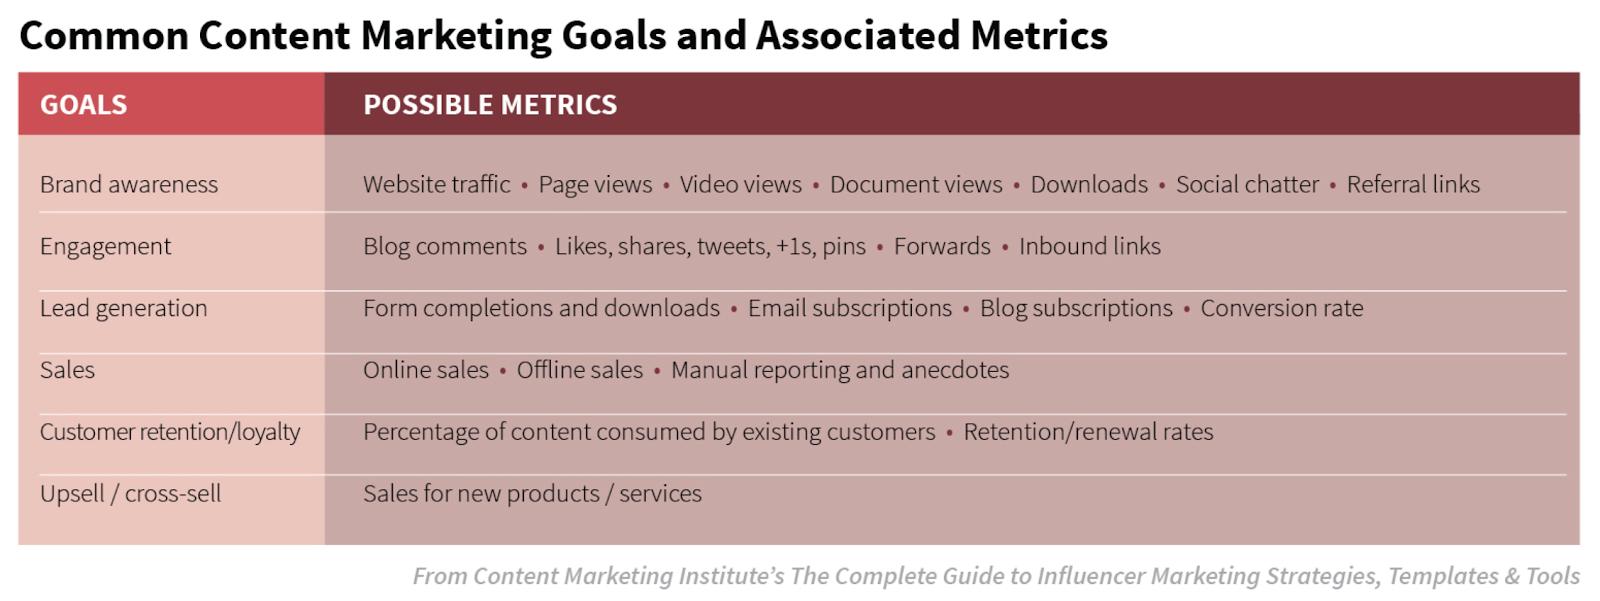 common Content marketing goas and associated metrics